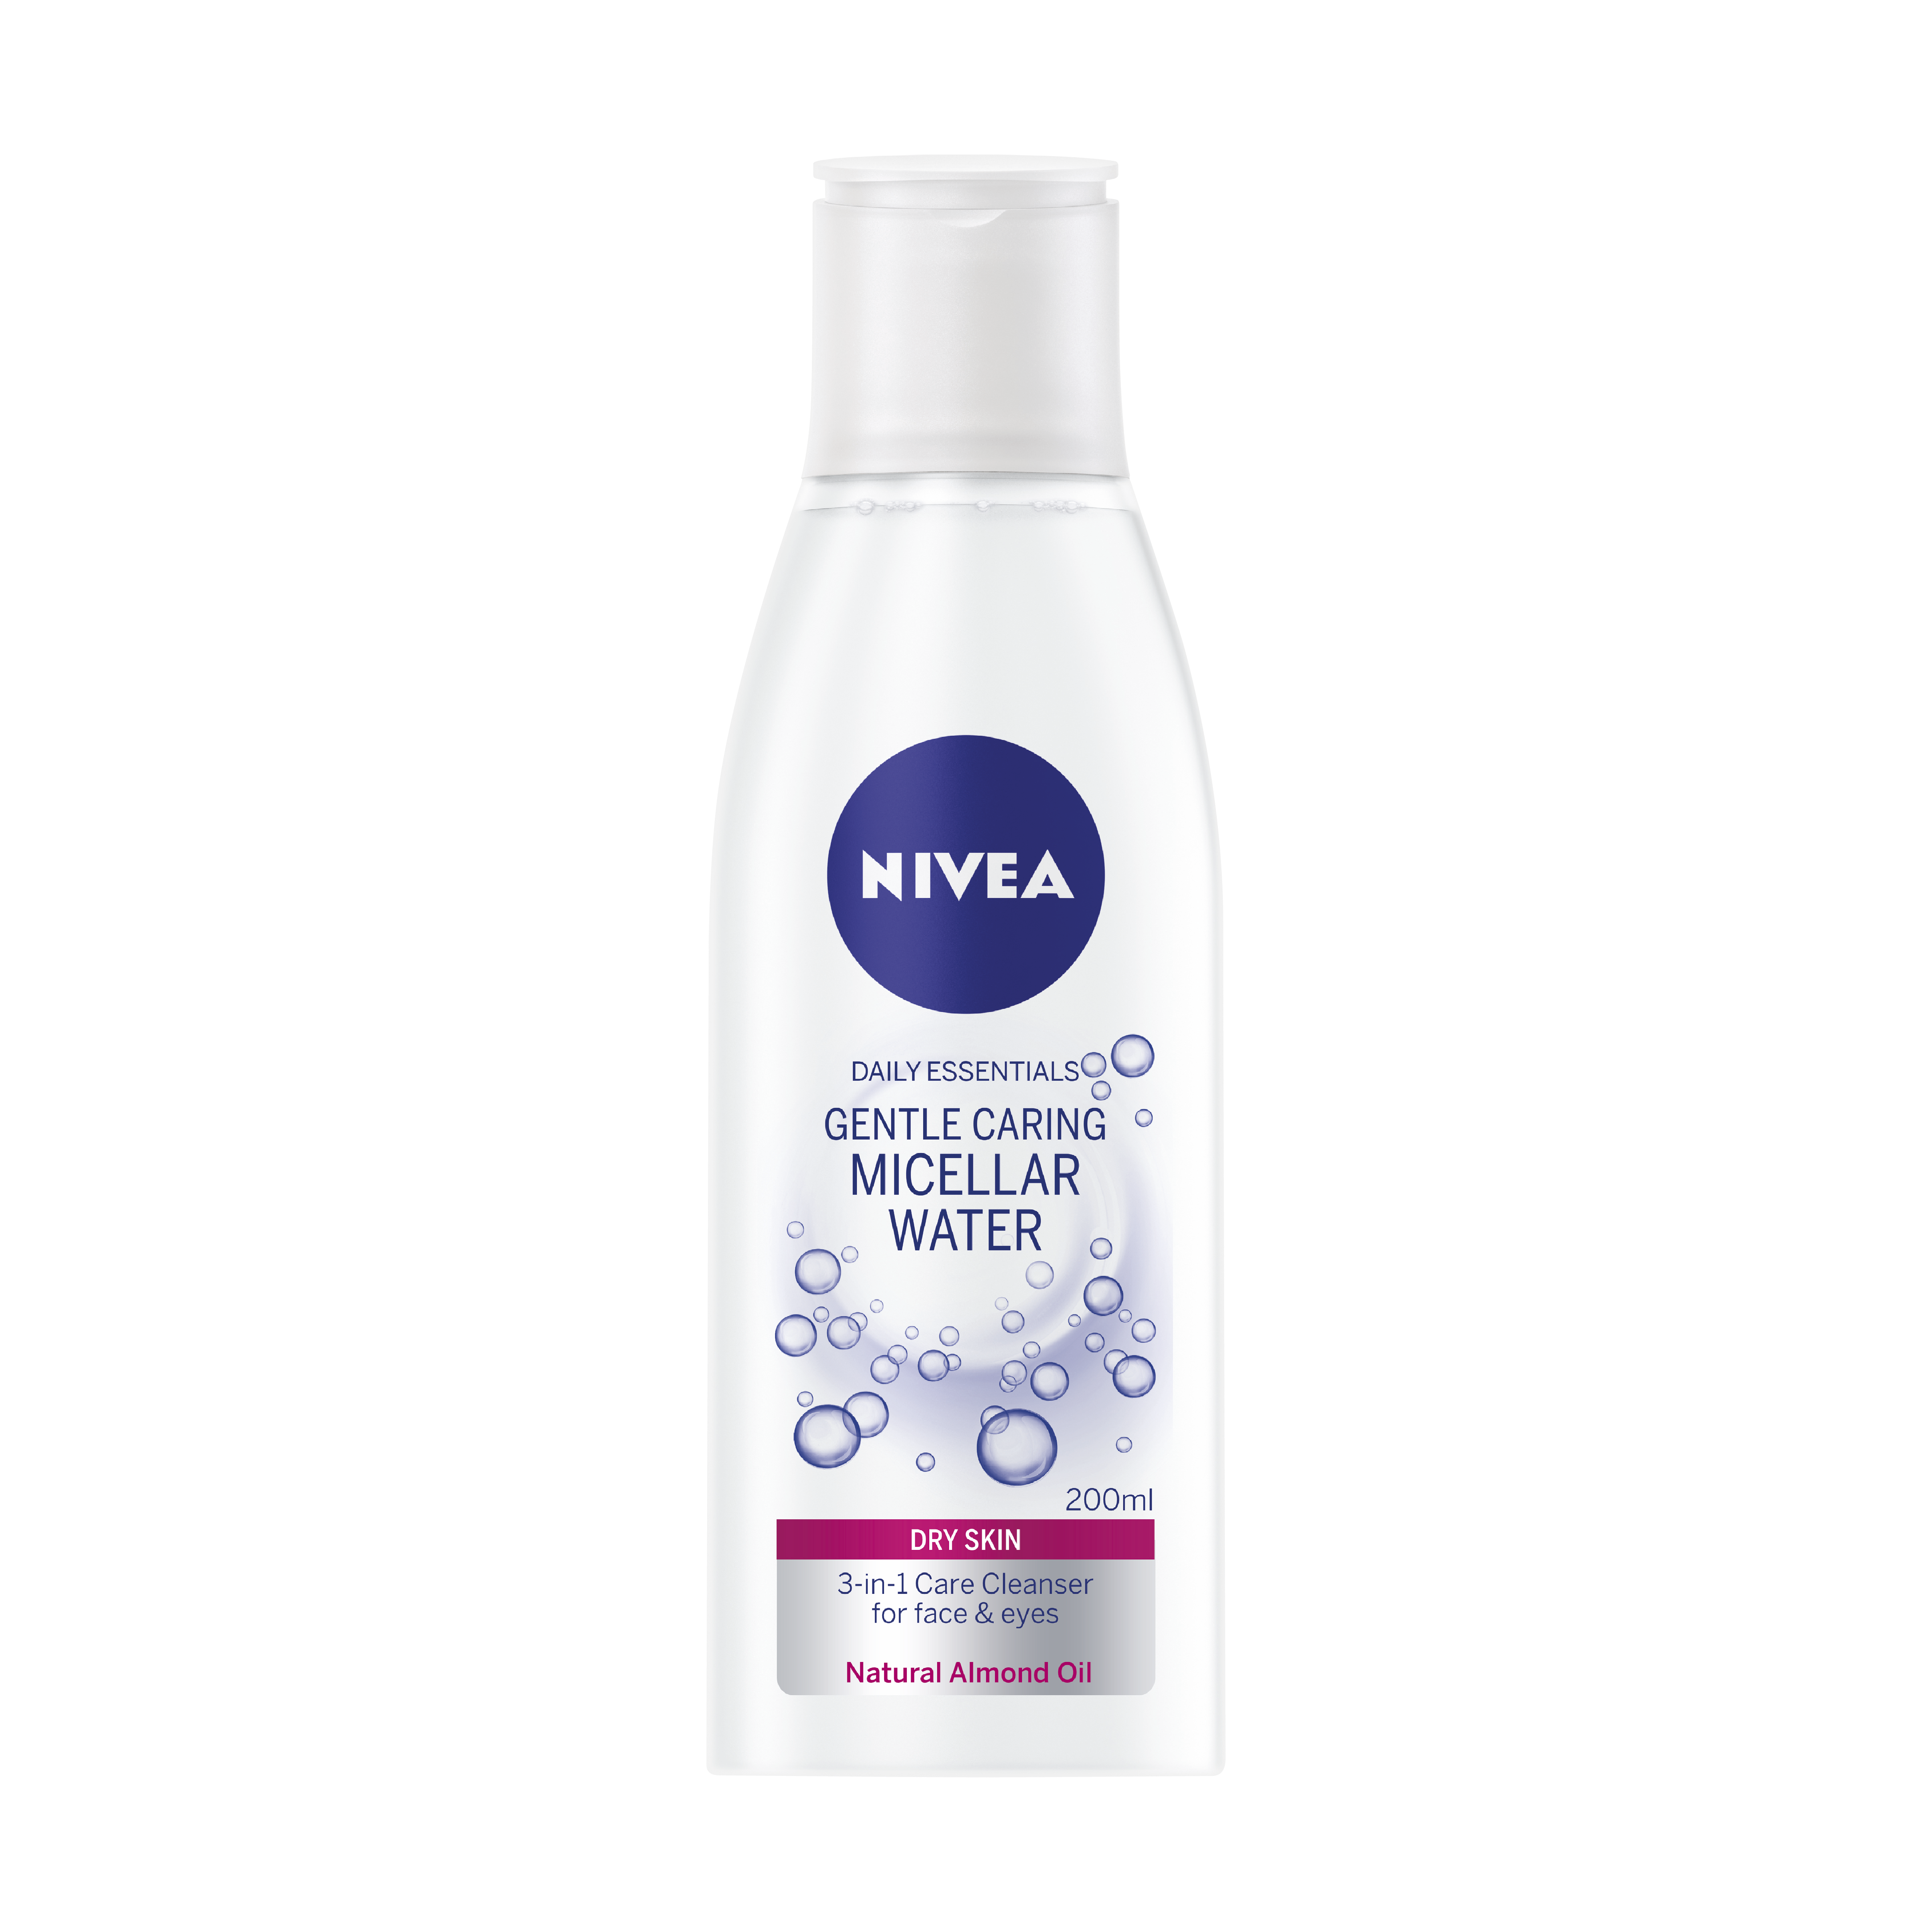 Gentle Caring Micellar Water Dry Skin